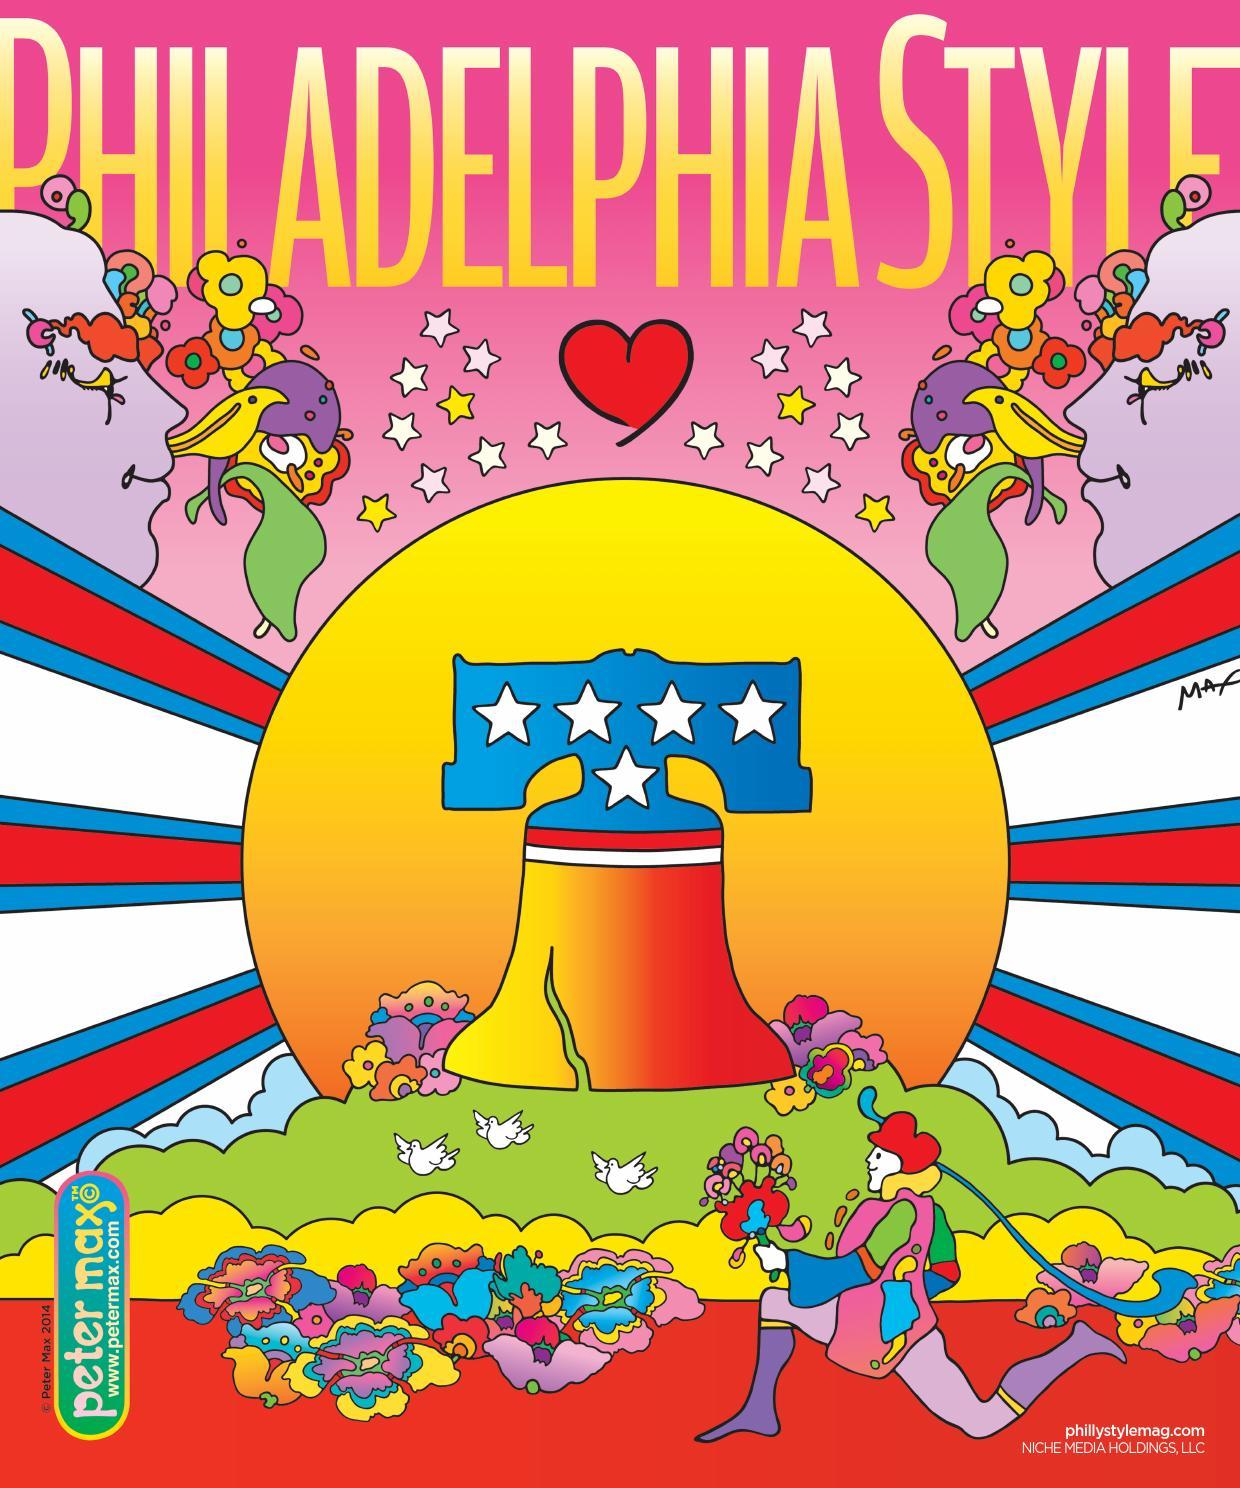 philadelphia style issue summer art of the city by philadelphia style 2014 issue 3 summer